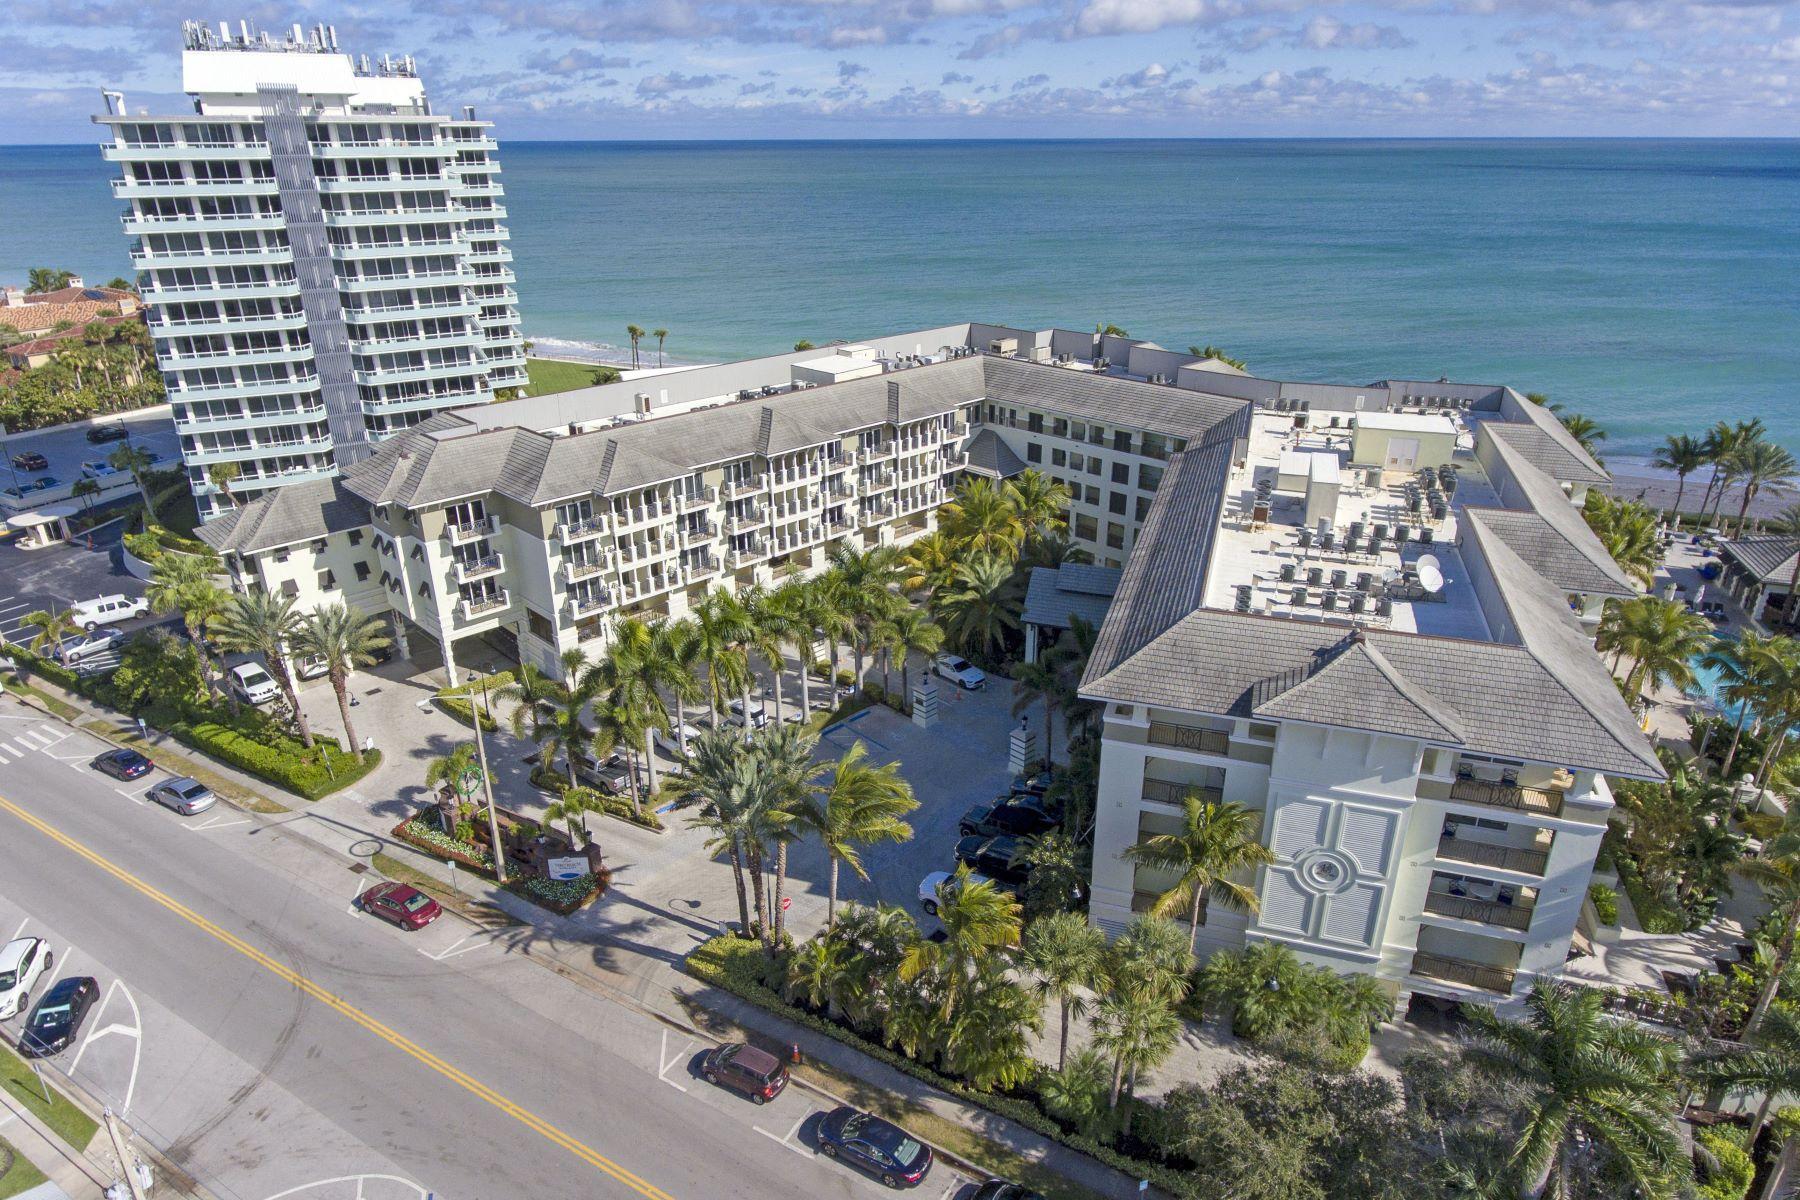 3500 Ocean Drive, #330, Vero Beach, FL 3500 Ocean Drive, 330 Vero Beach, Florida 32963 Vereinigte Staaten